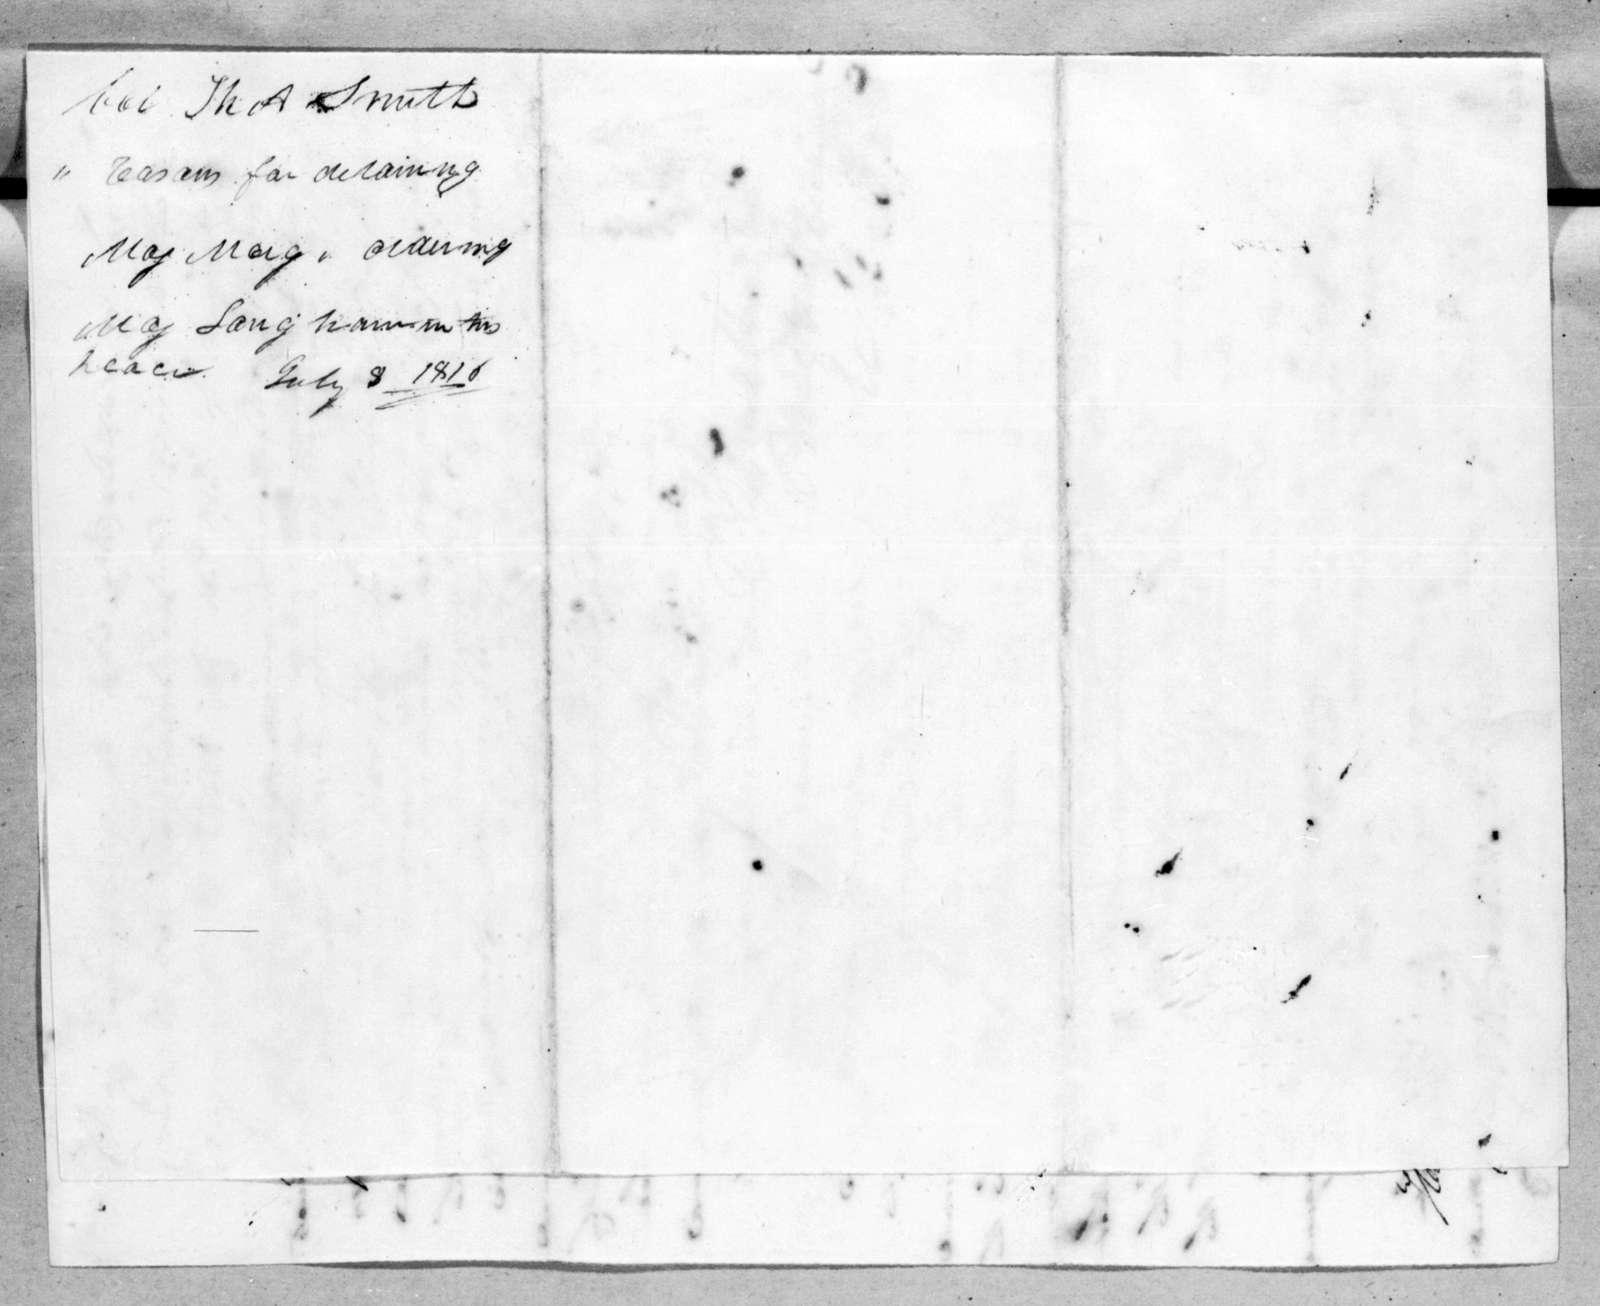 Thomas Adams Smith to Andrew Jackson, July 8, 1816